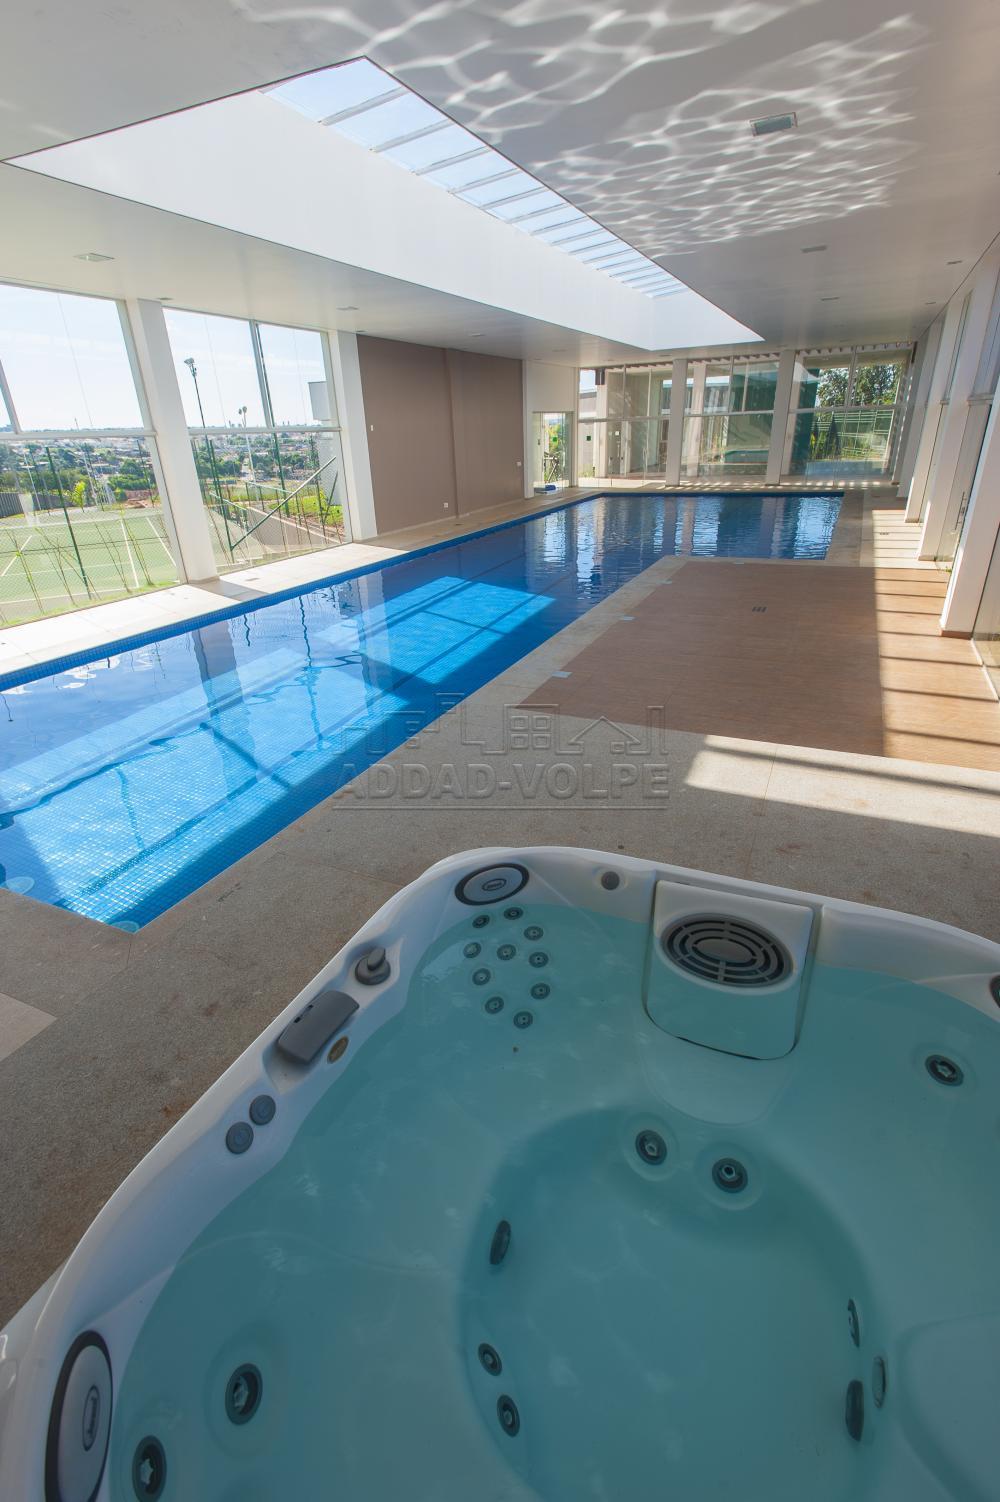 Comprar Casa / Condomínio em Bauru apenas R$ 1.280.000,00 - Foto 42